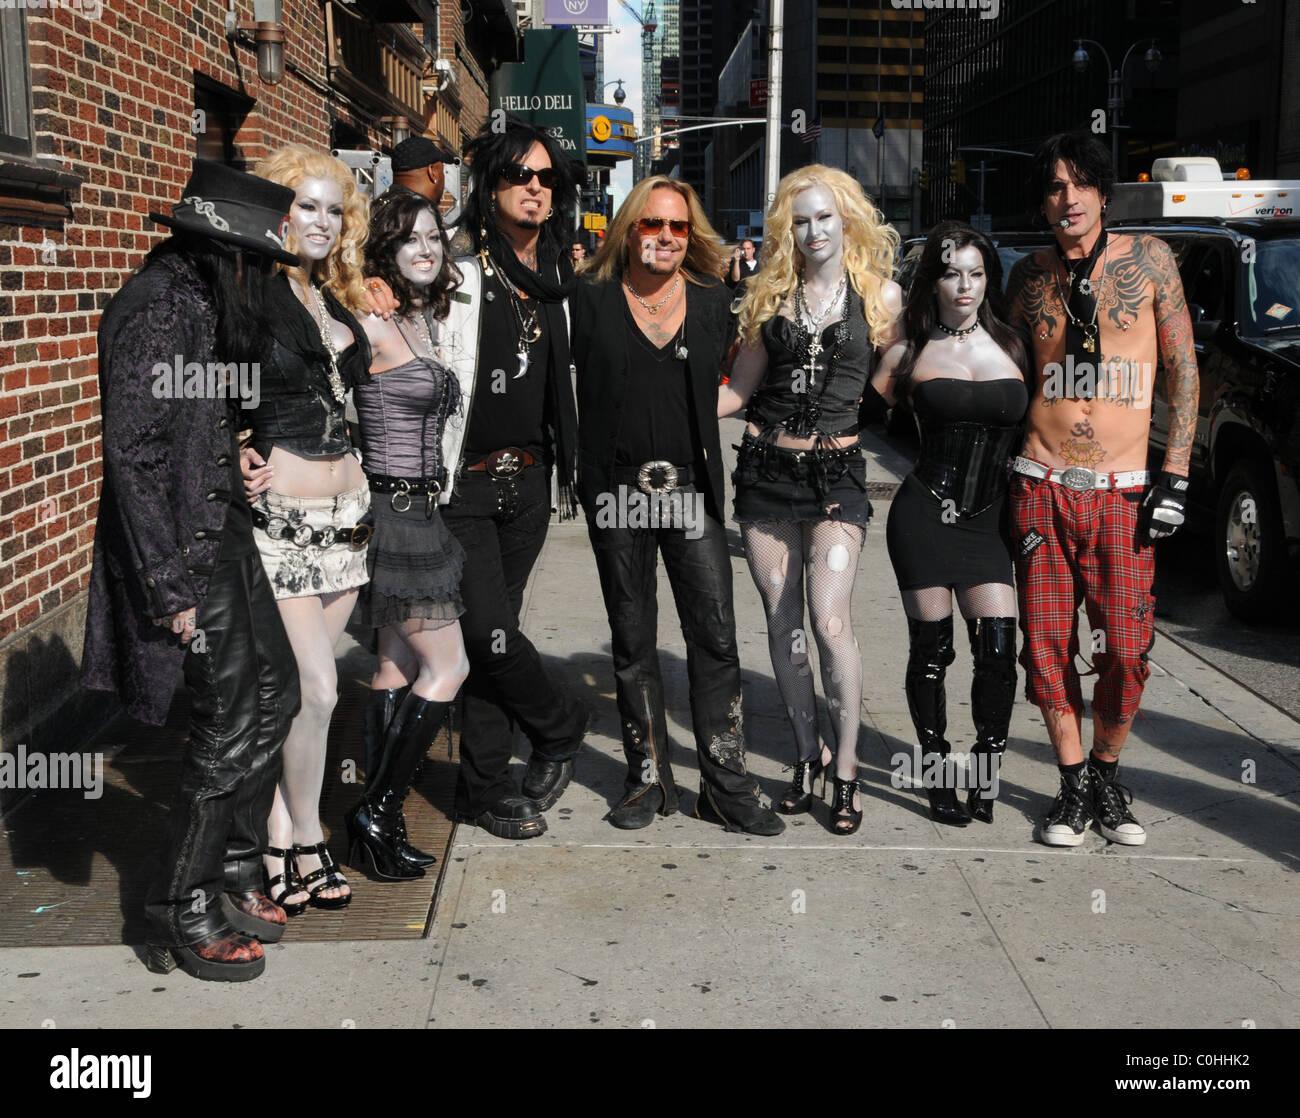 Motley Crue Mick Mars Nikki Sixx Vince Neil Tommy Lee Girls